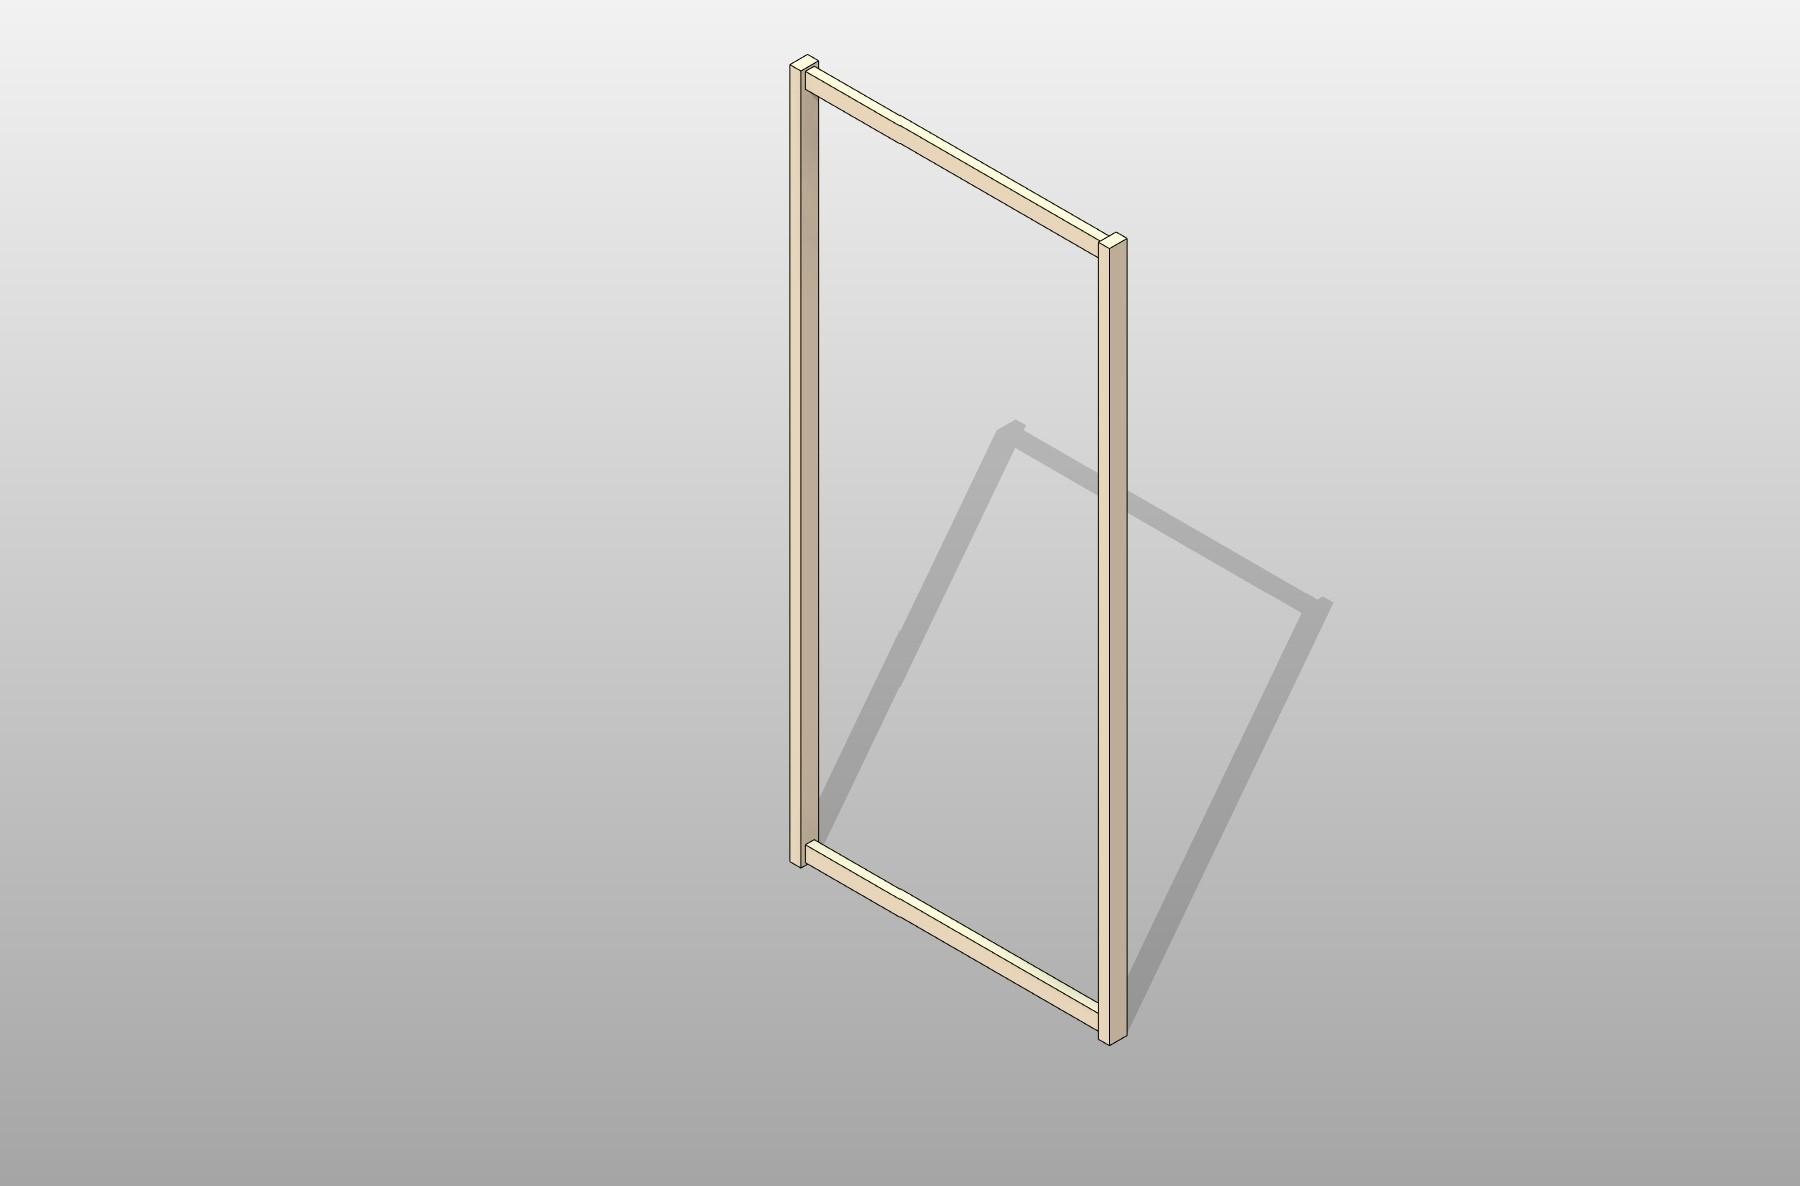 Frame Cantilever Shelving